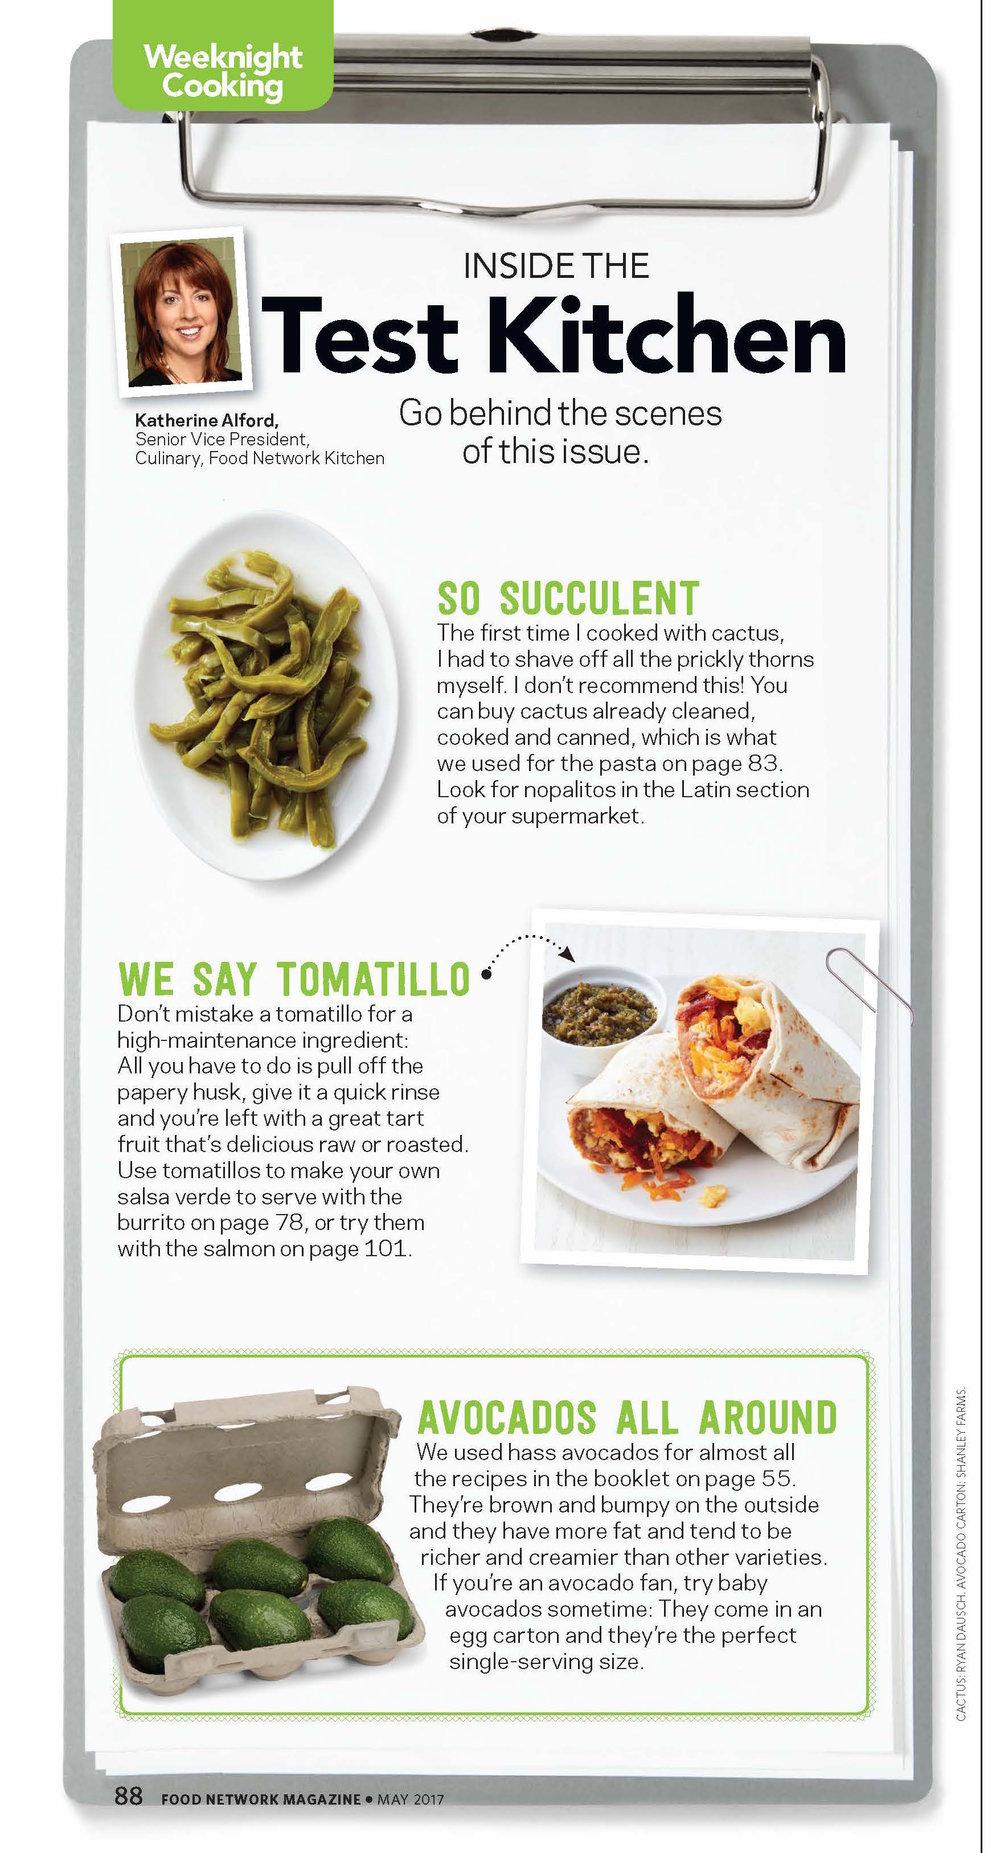 Copyright © 2017 Food Network Magazine